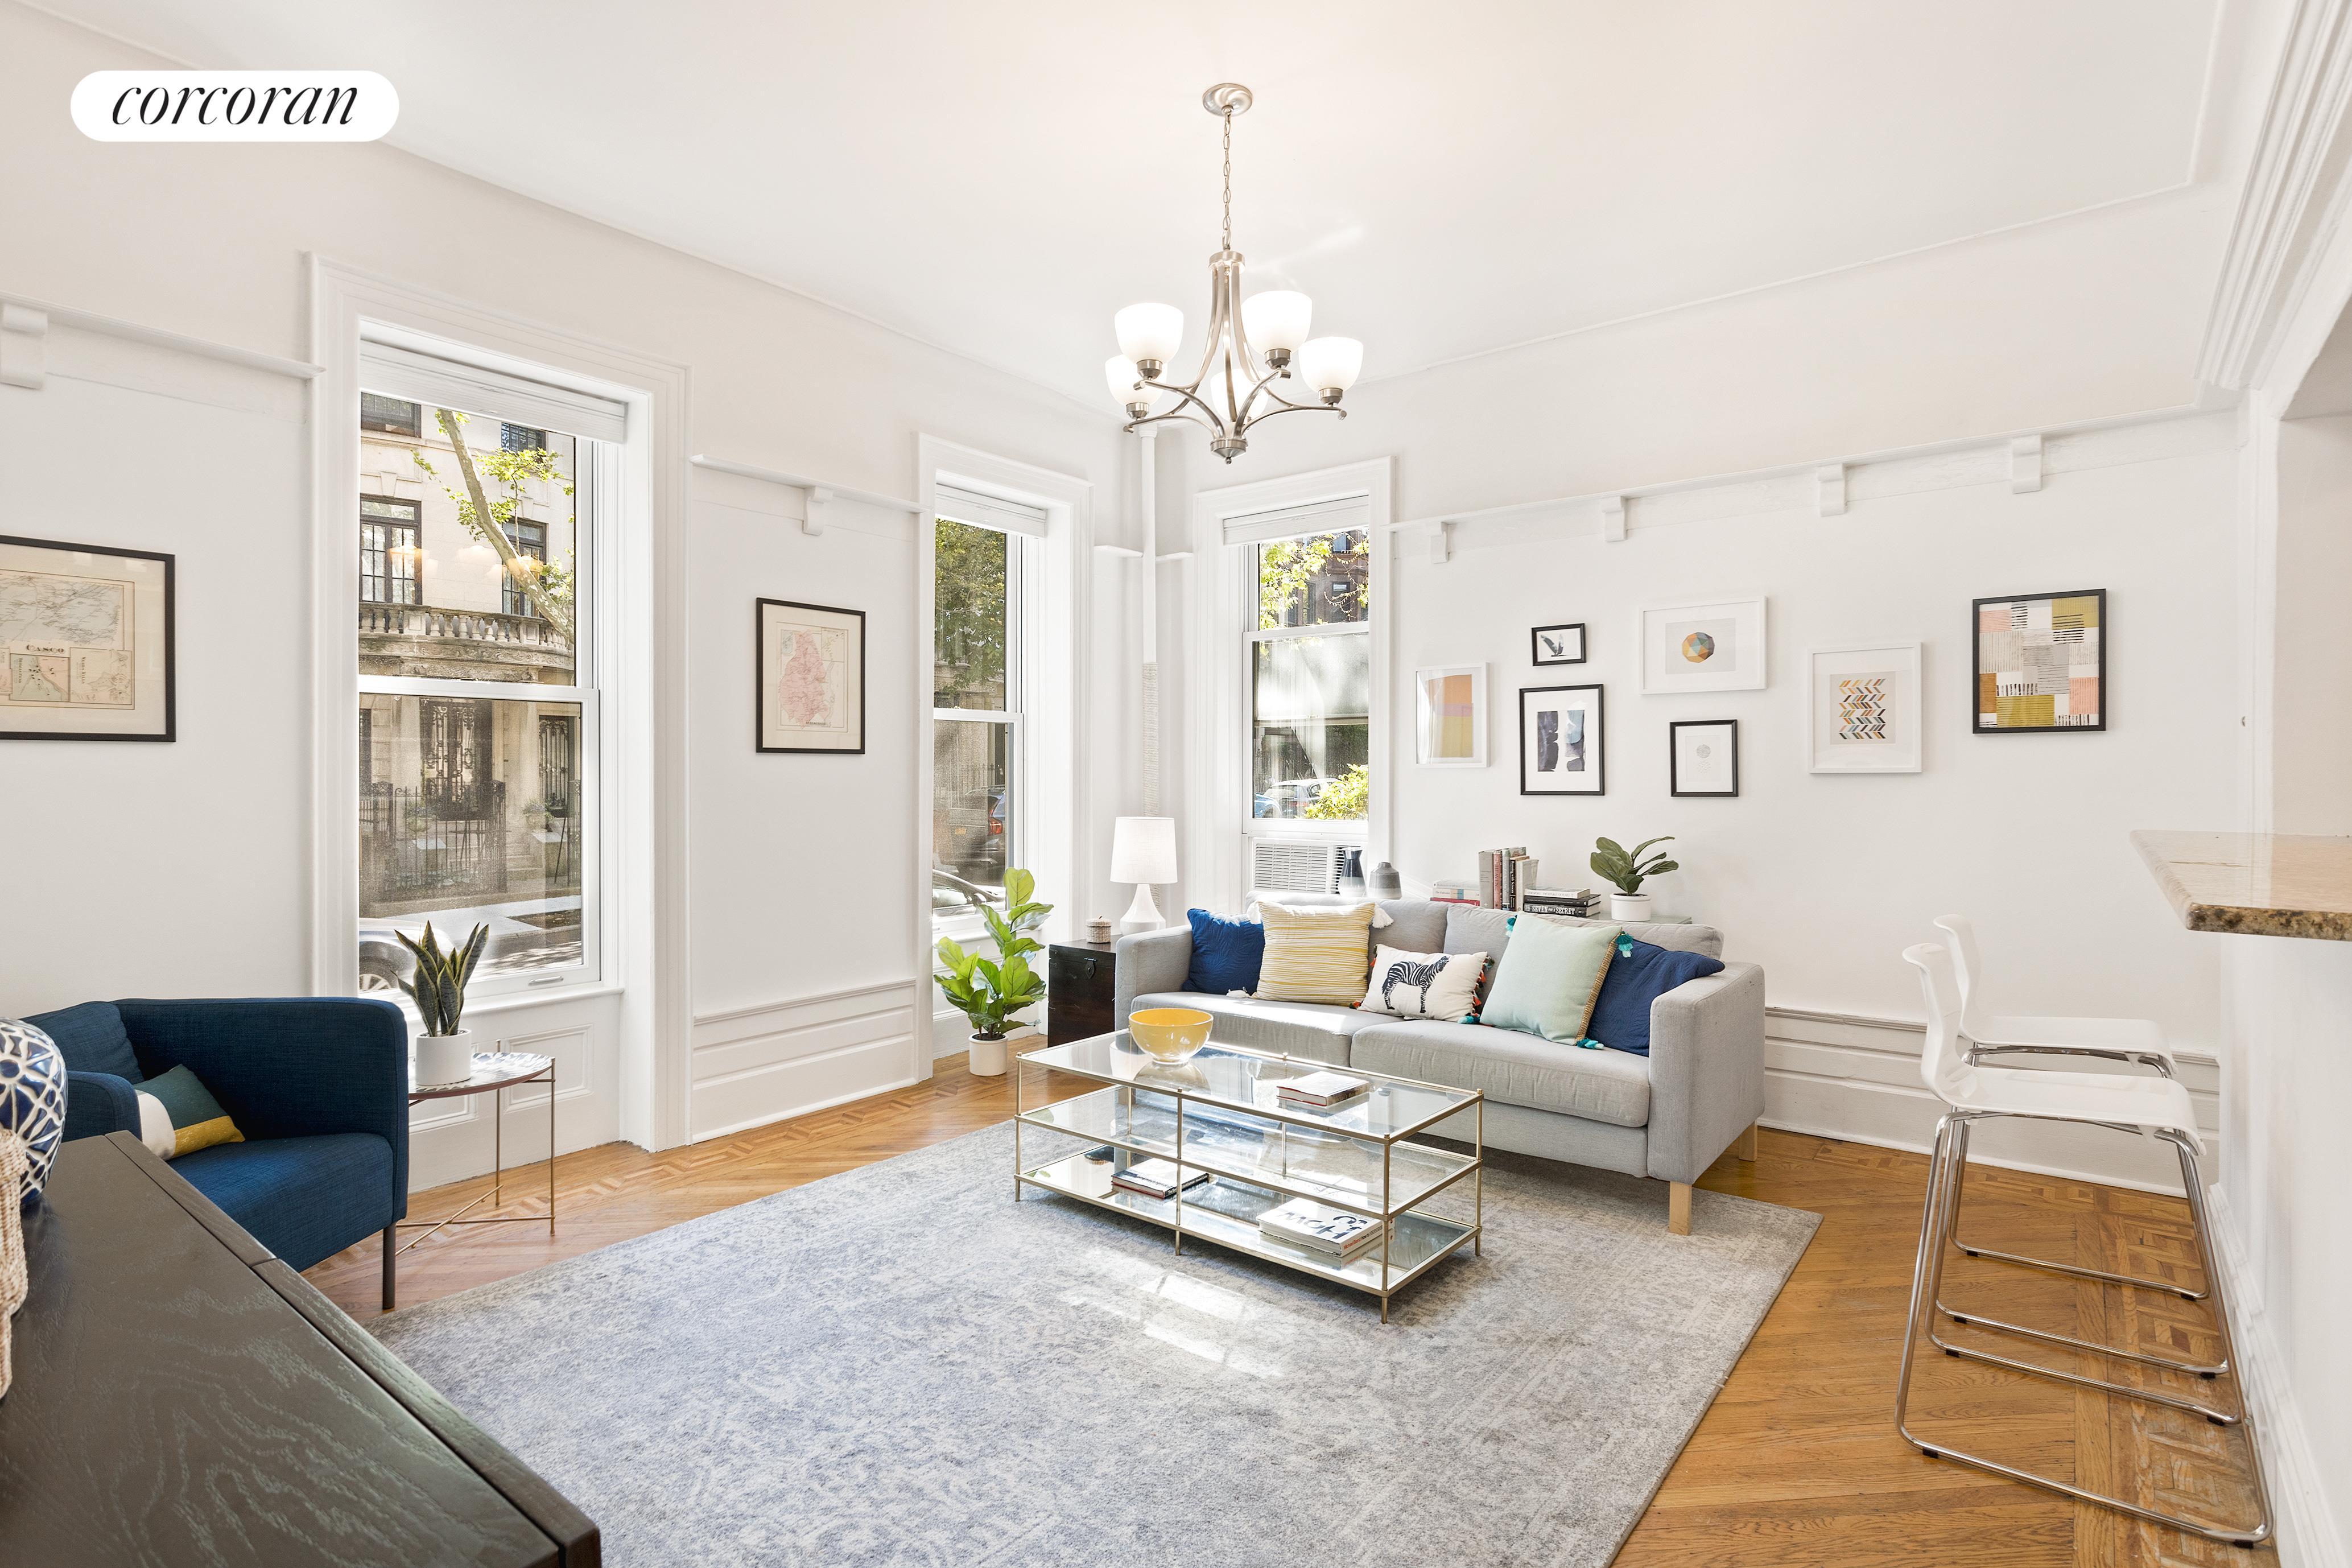 Corcoran, 530 1st Street, Apt  2, Park Slope Real Estate